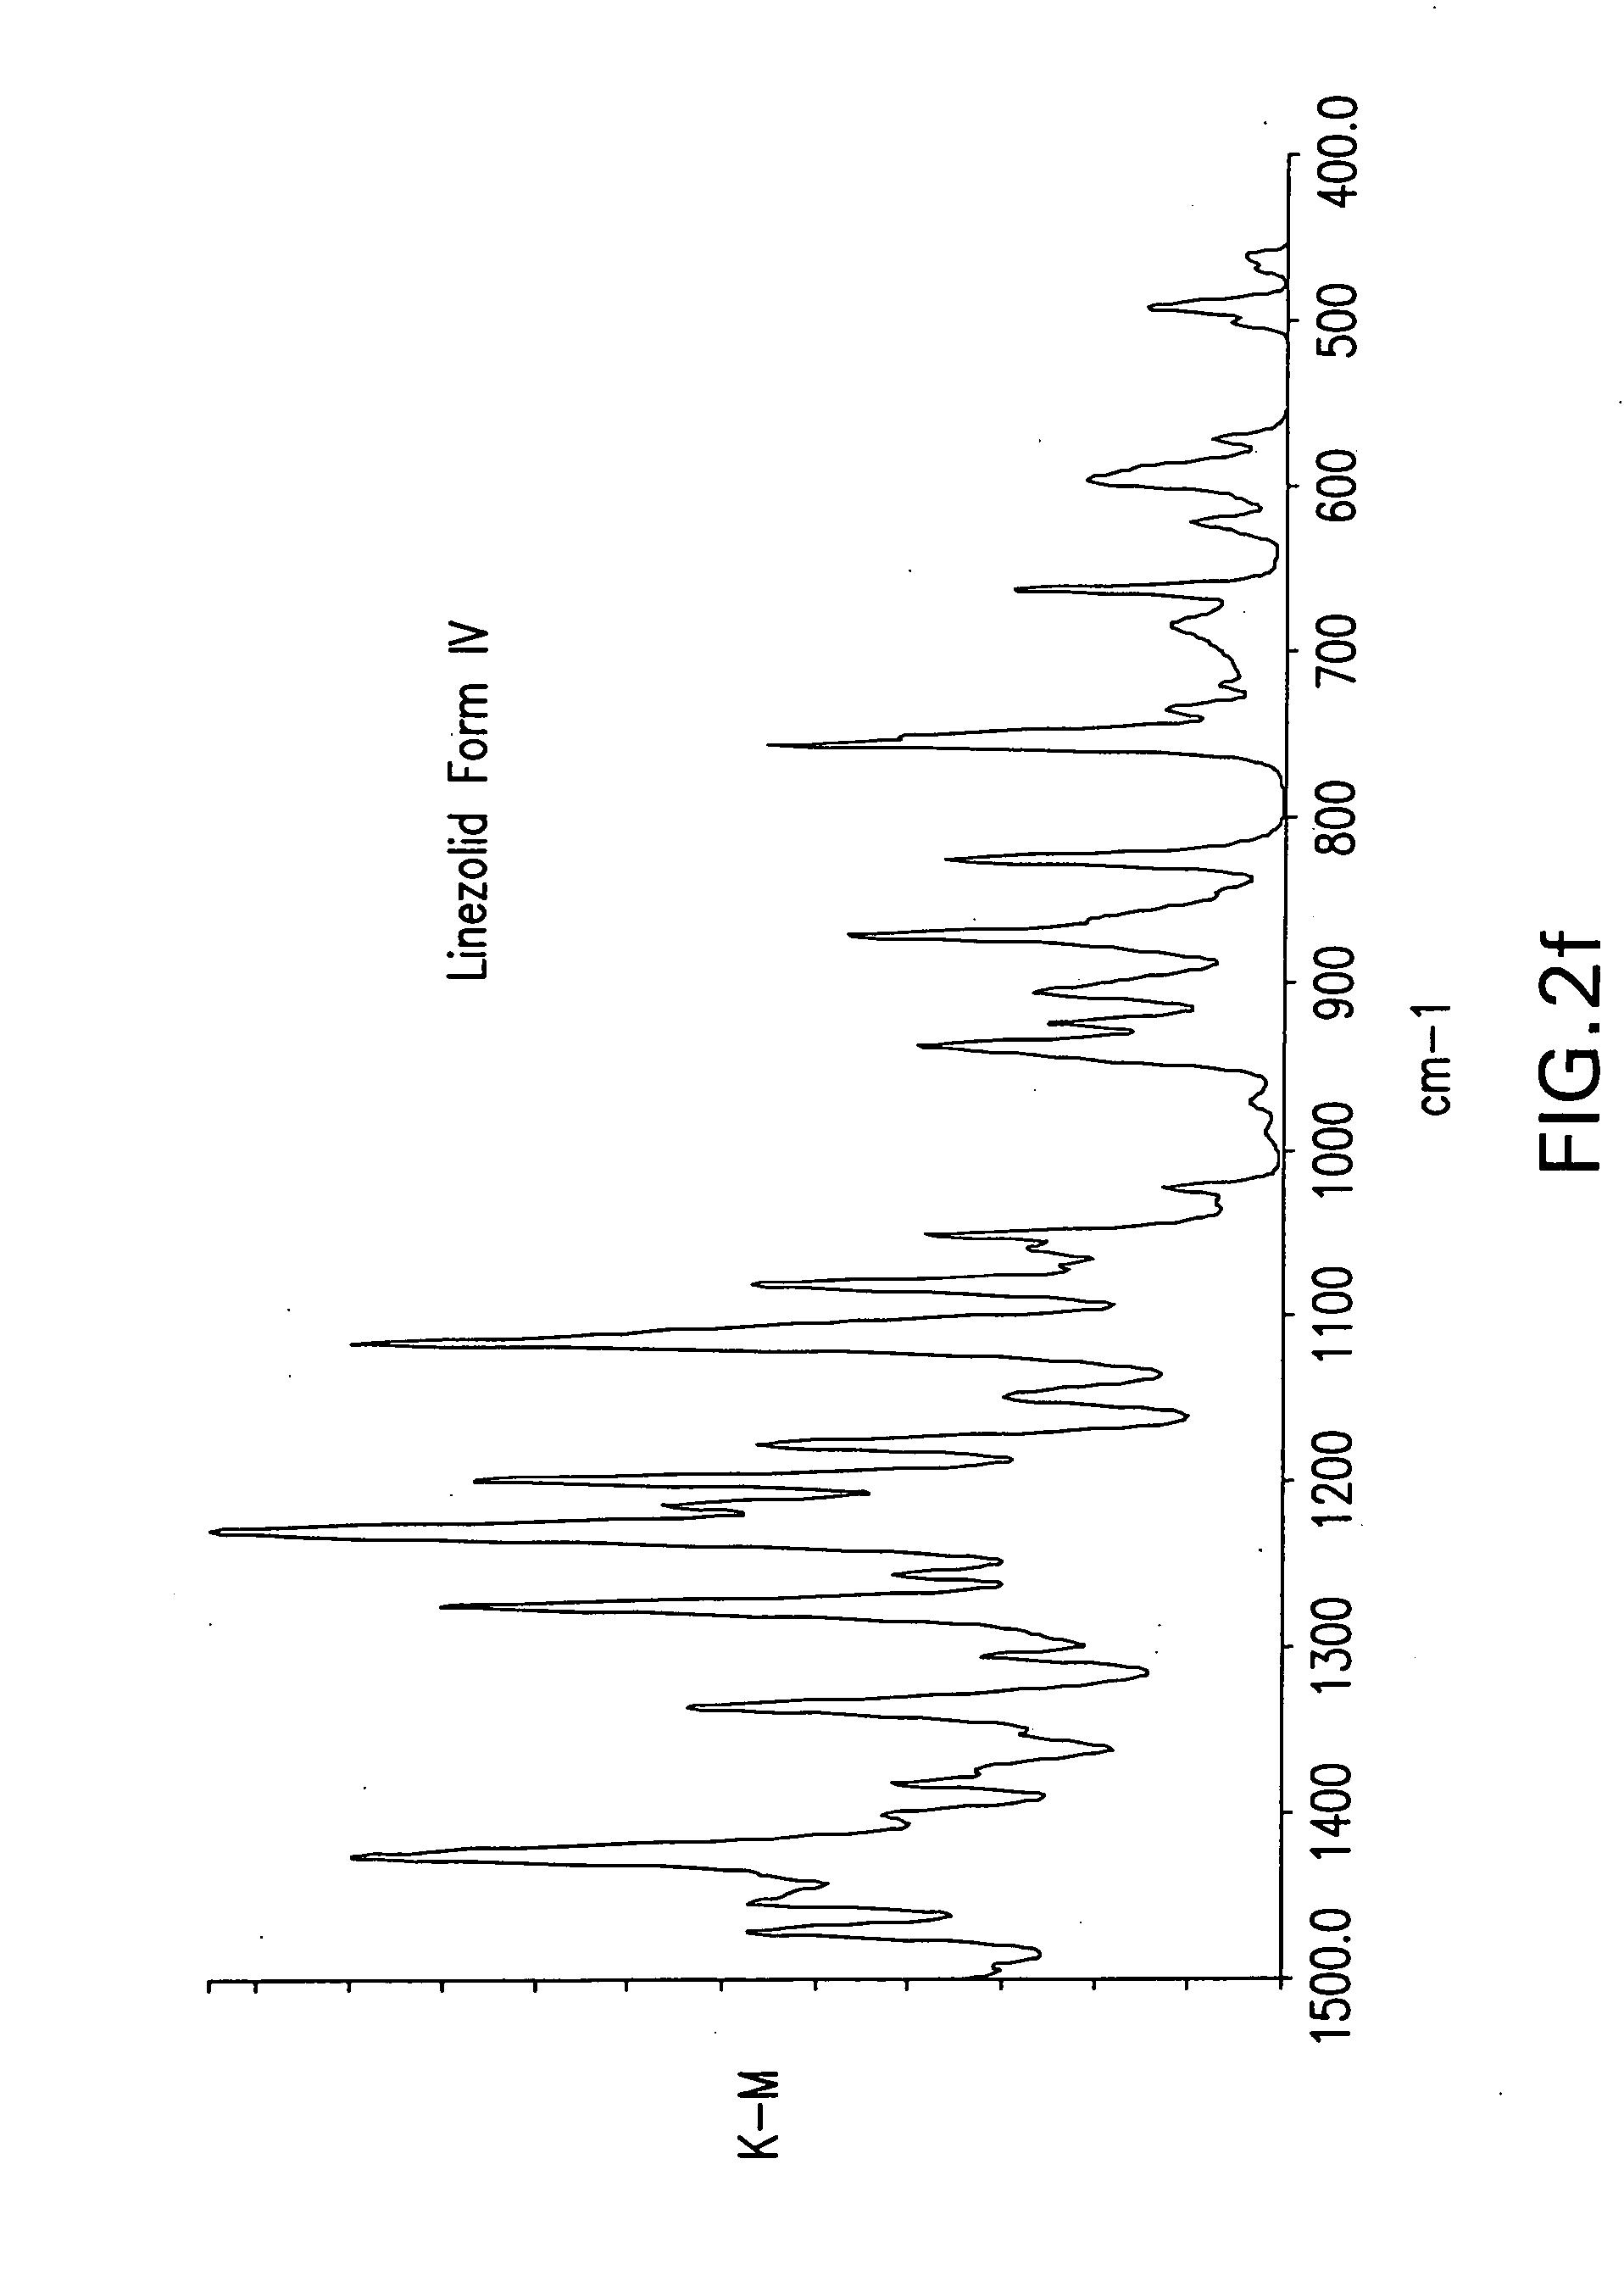 Zyvox 600 mg indicaciones.doc - Patent Drawing